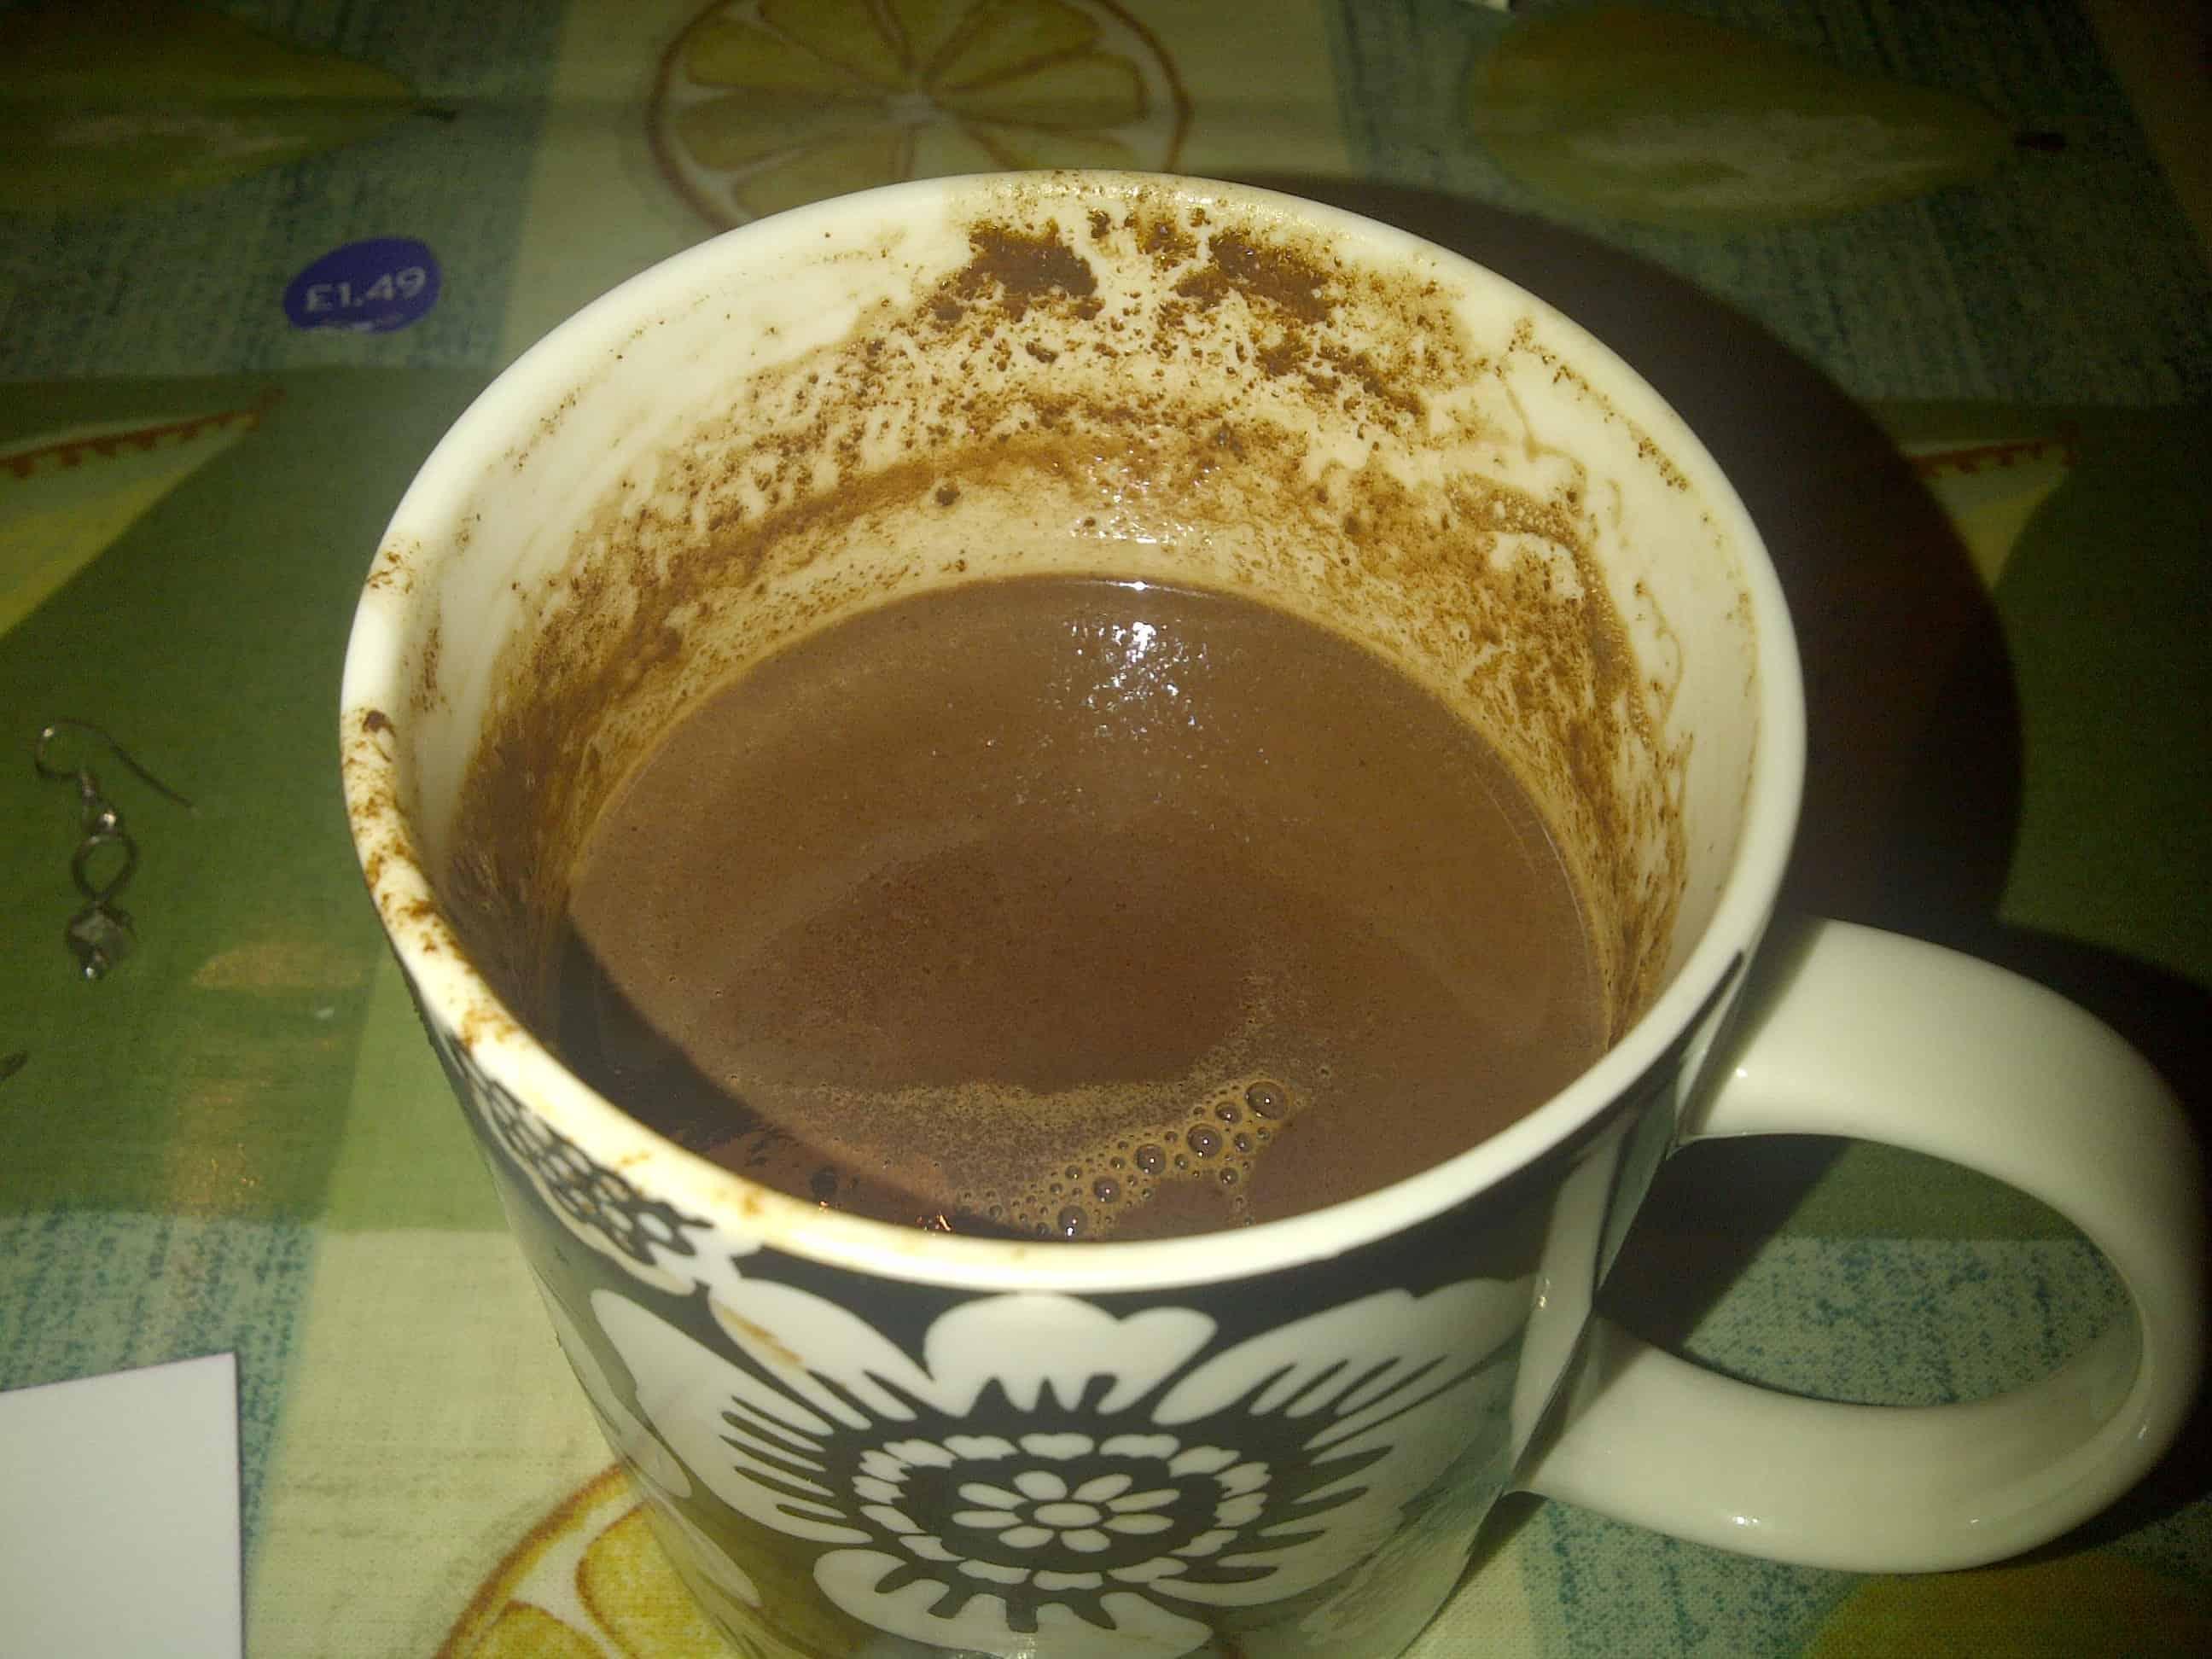 Hot chocolate - because everyone needs a break sometimes!